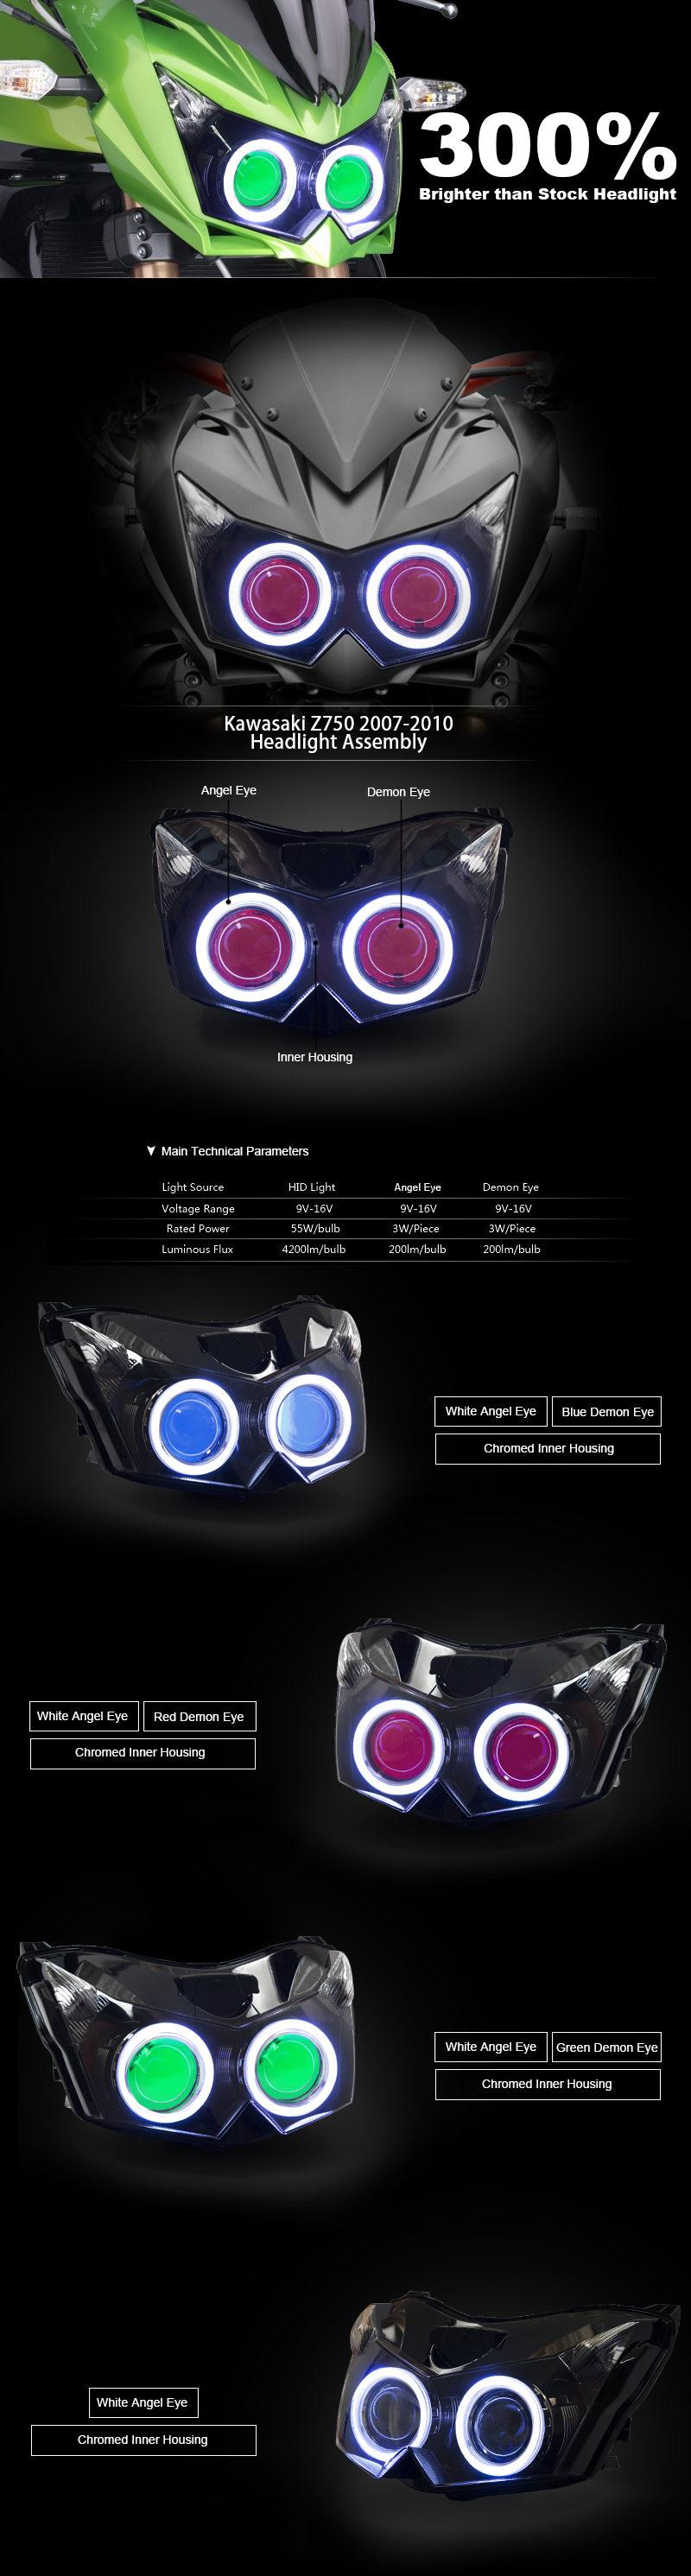 Z750 Headlight 2007 2008 2009 2010